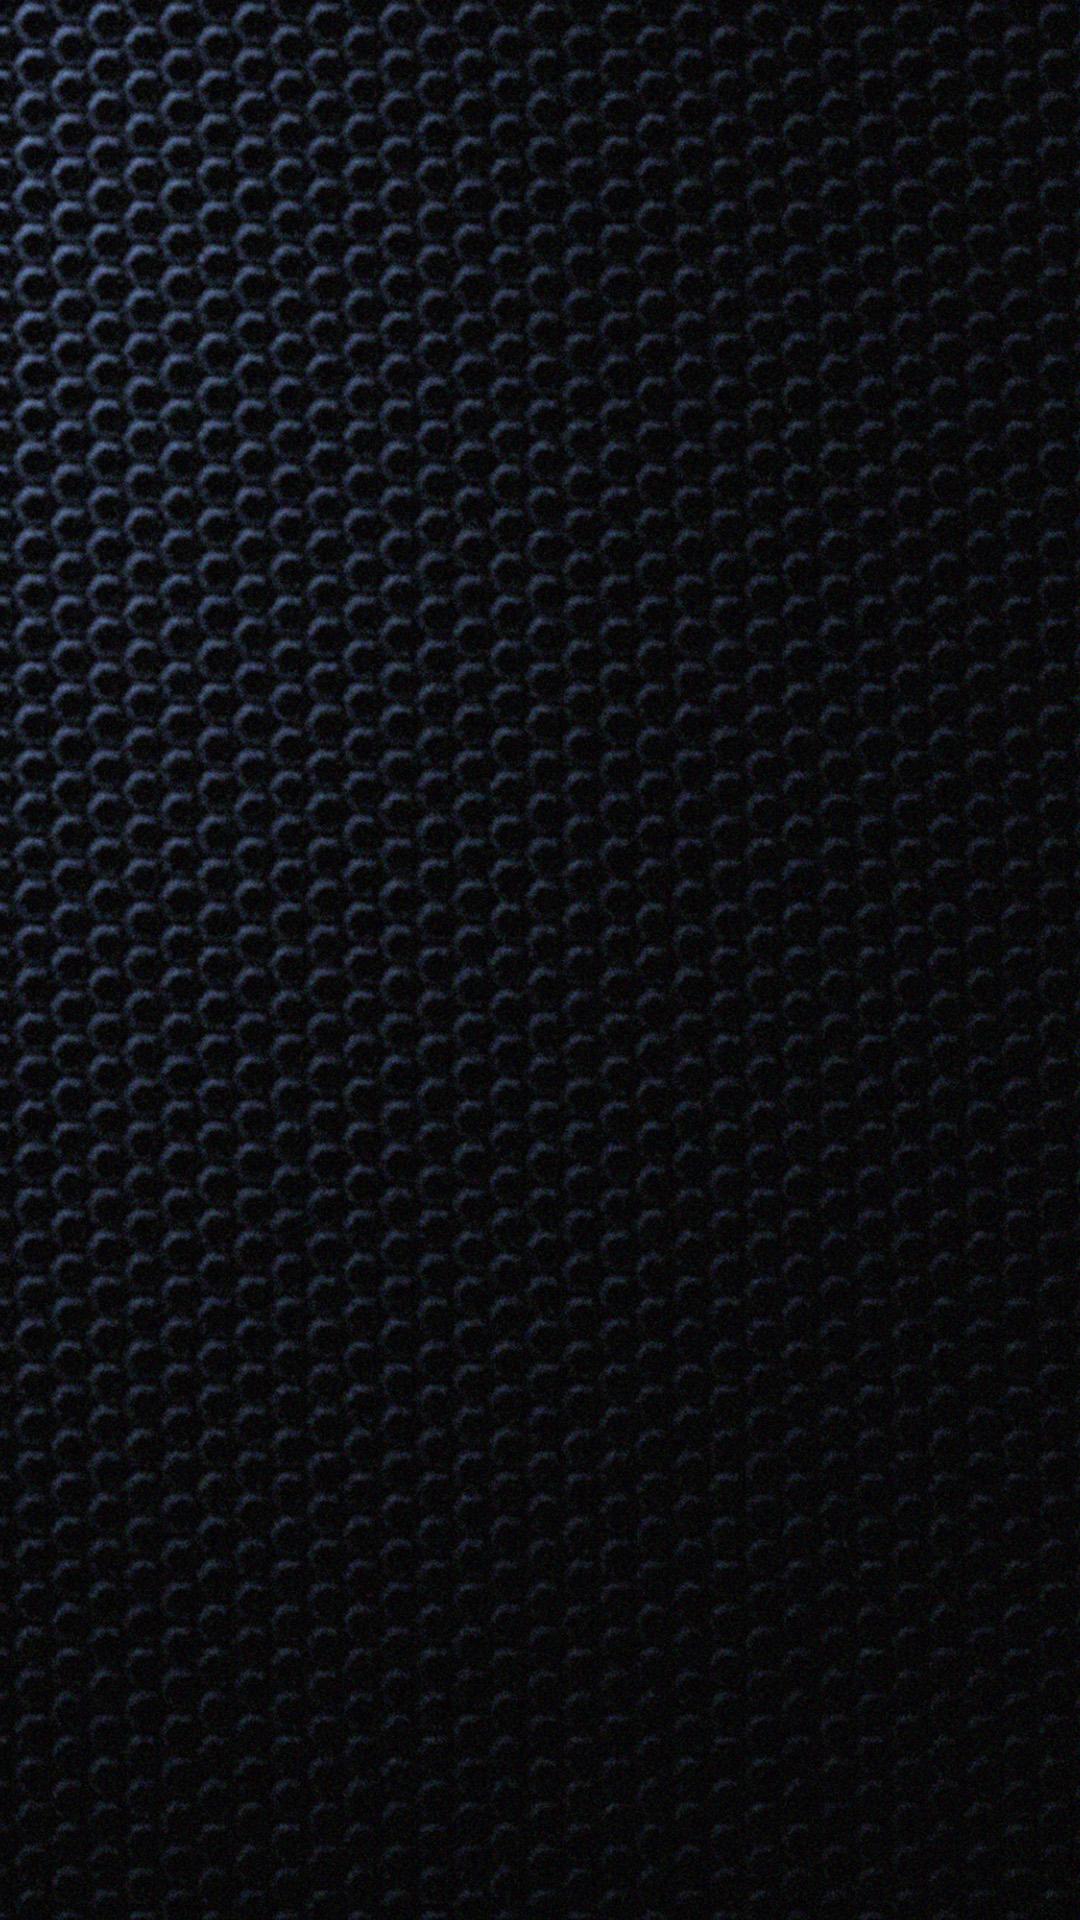 Black Texture 06 Galaxy S5 Wallpapers Samsung Galaxy S5 Wallpapers HD 1080x1920